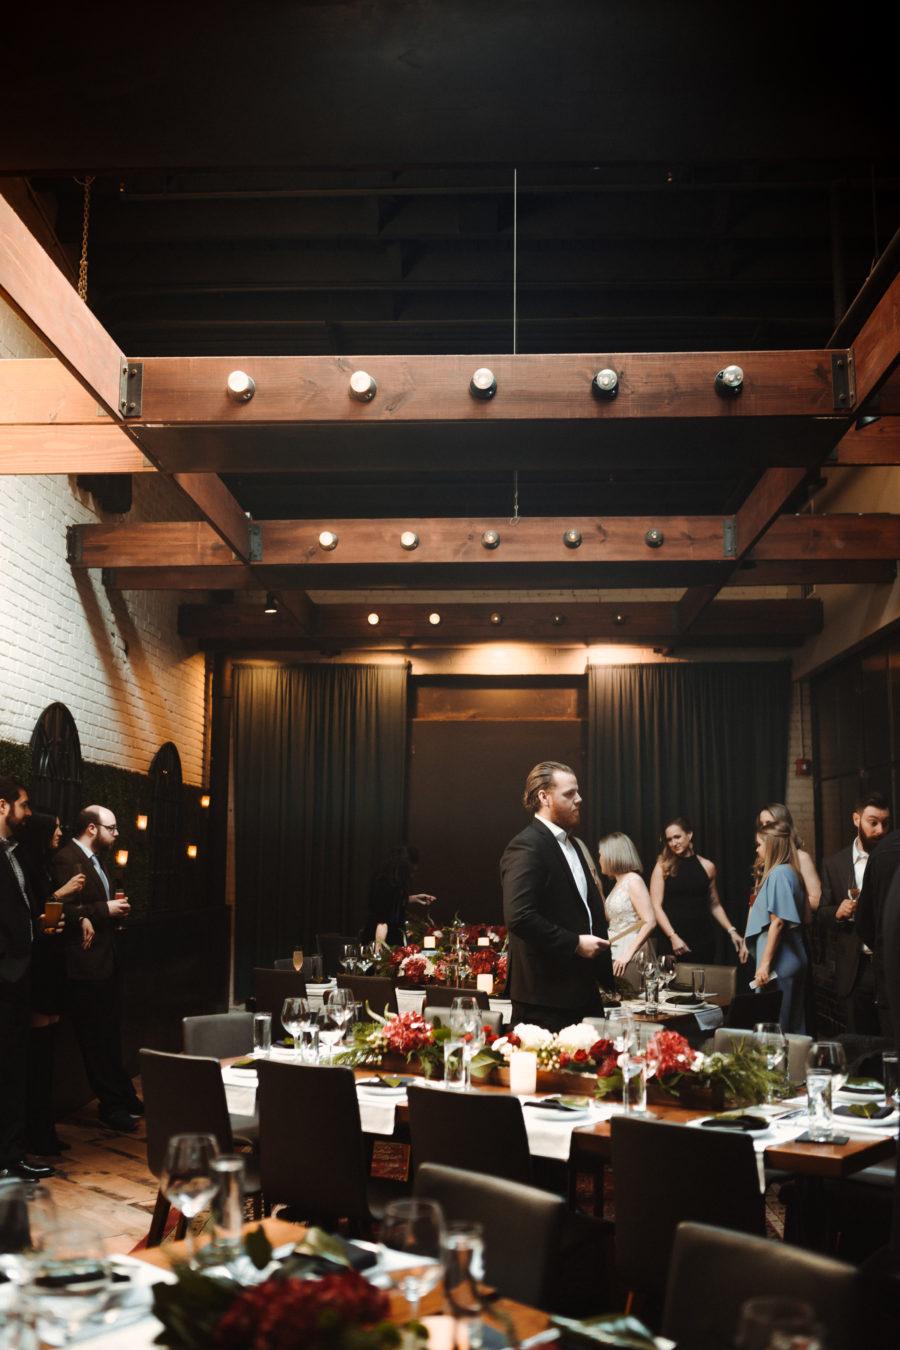 Moto Nashville Elopement: Nashville brunch elopement featured on Nashville Bride Guide